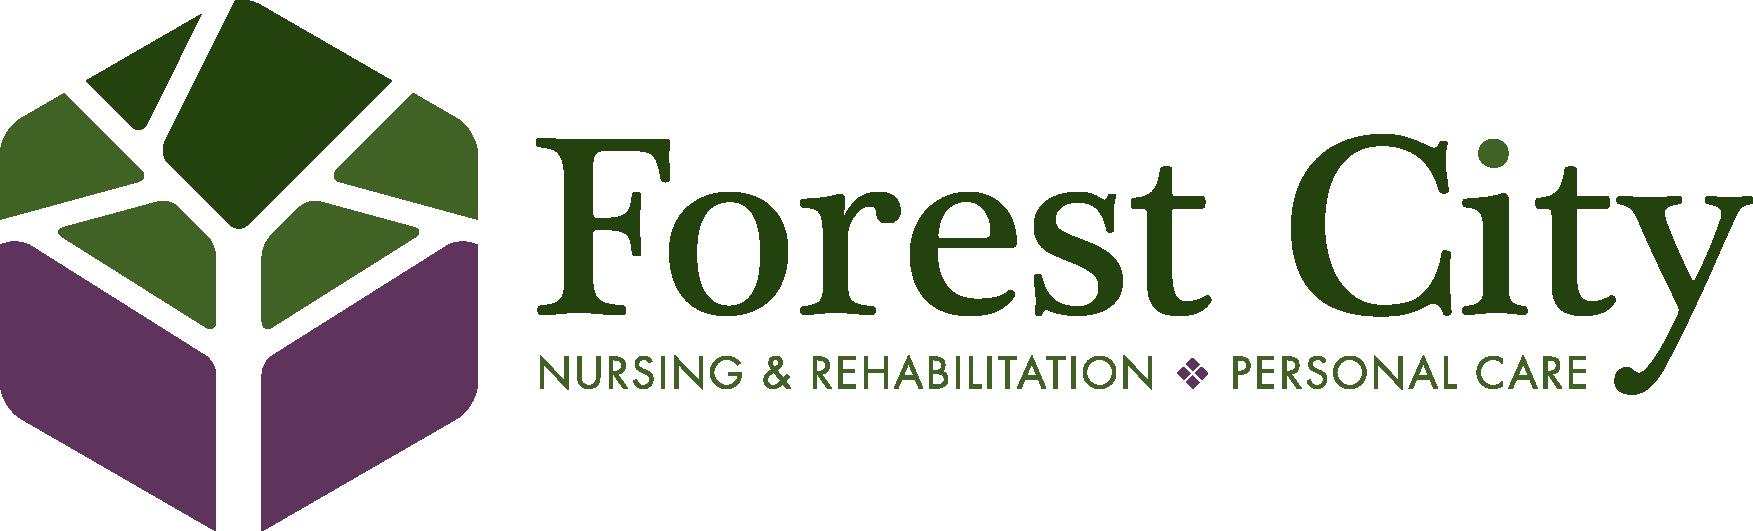 Forest City Nursing and Rehabilitation